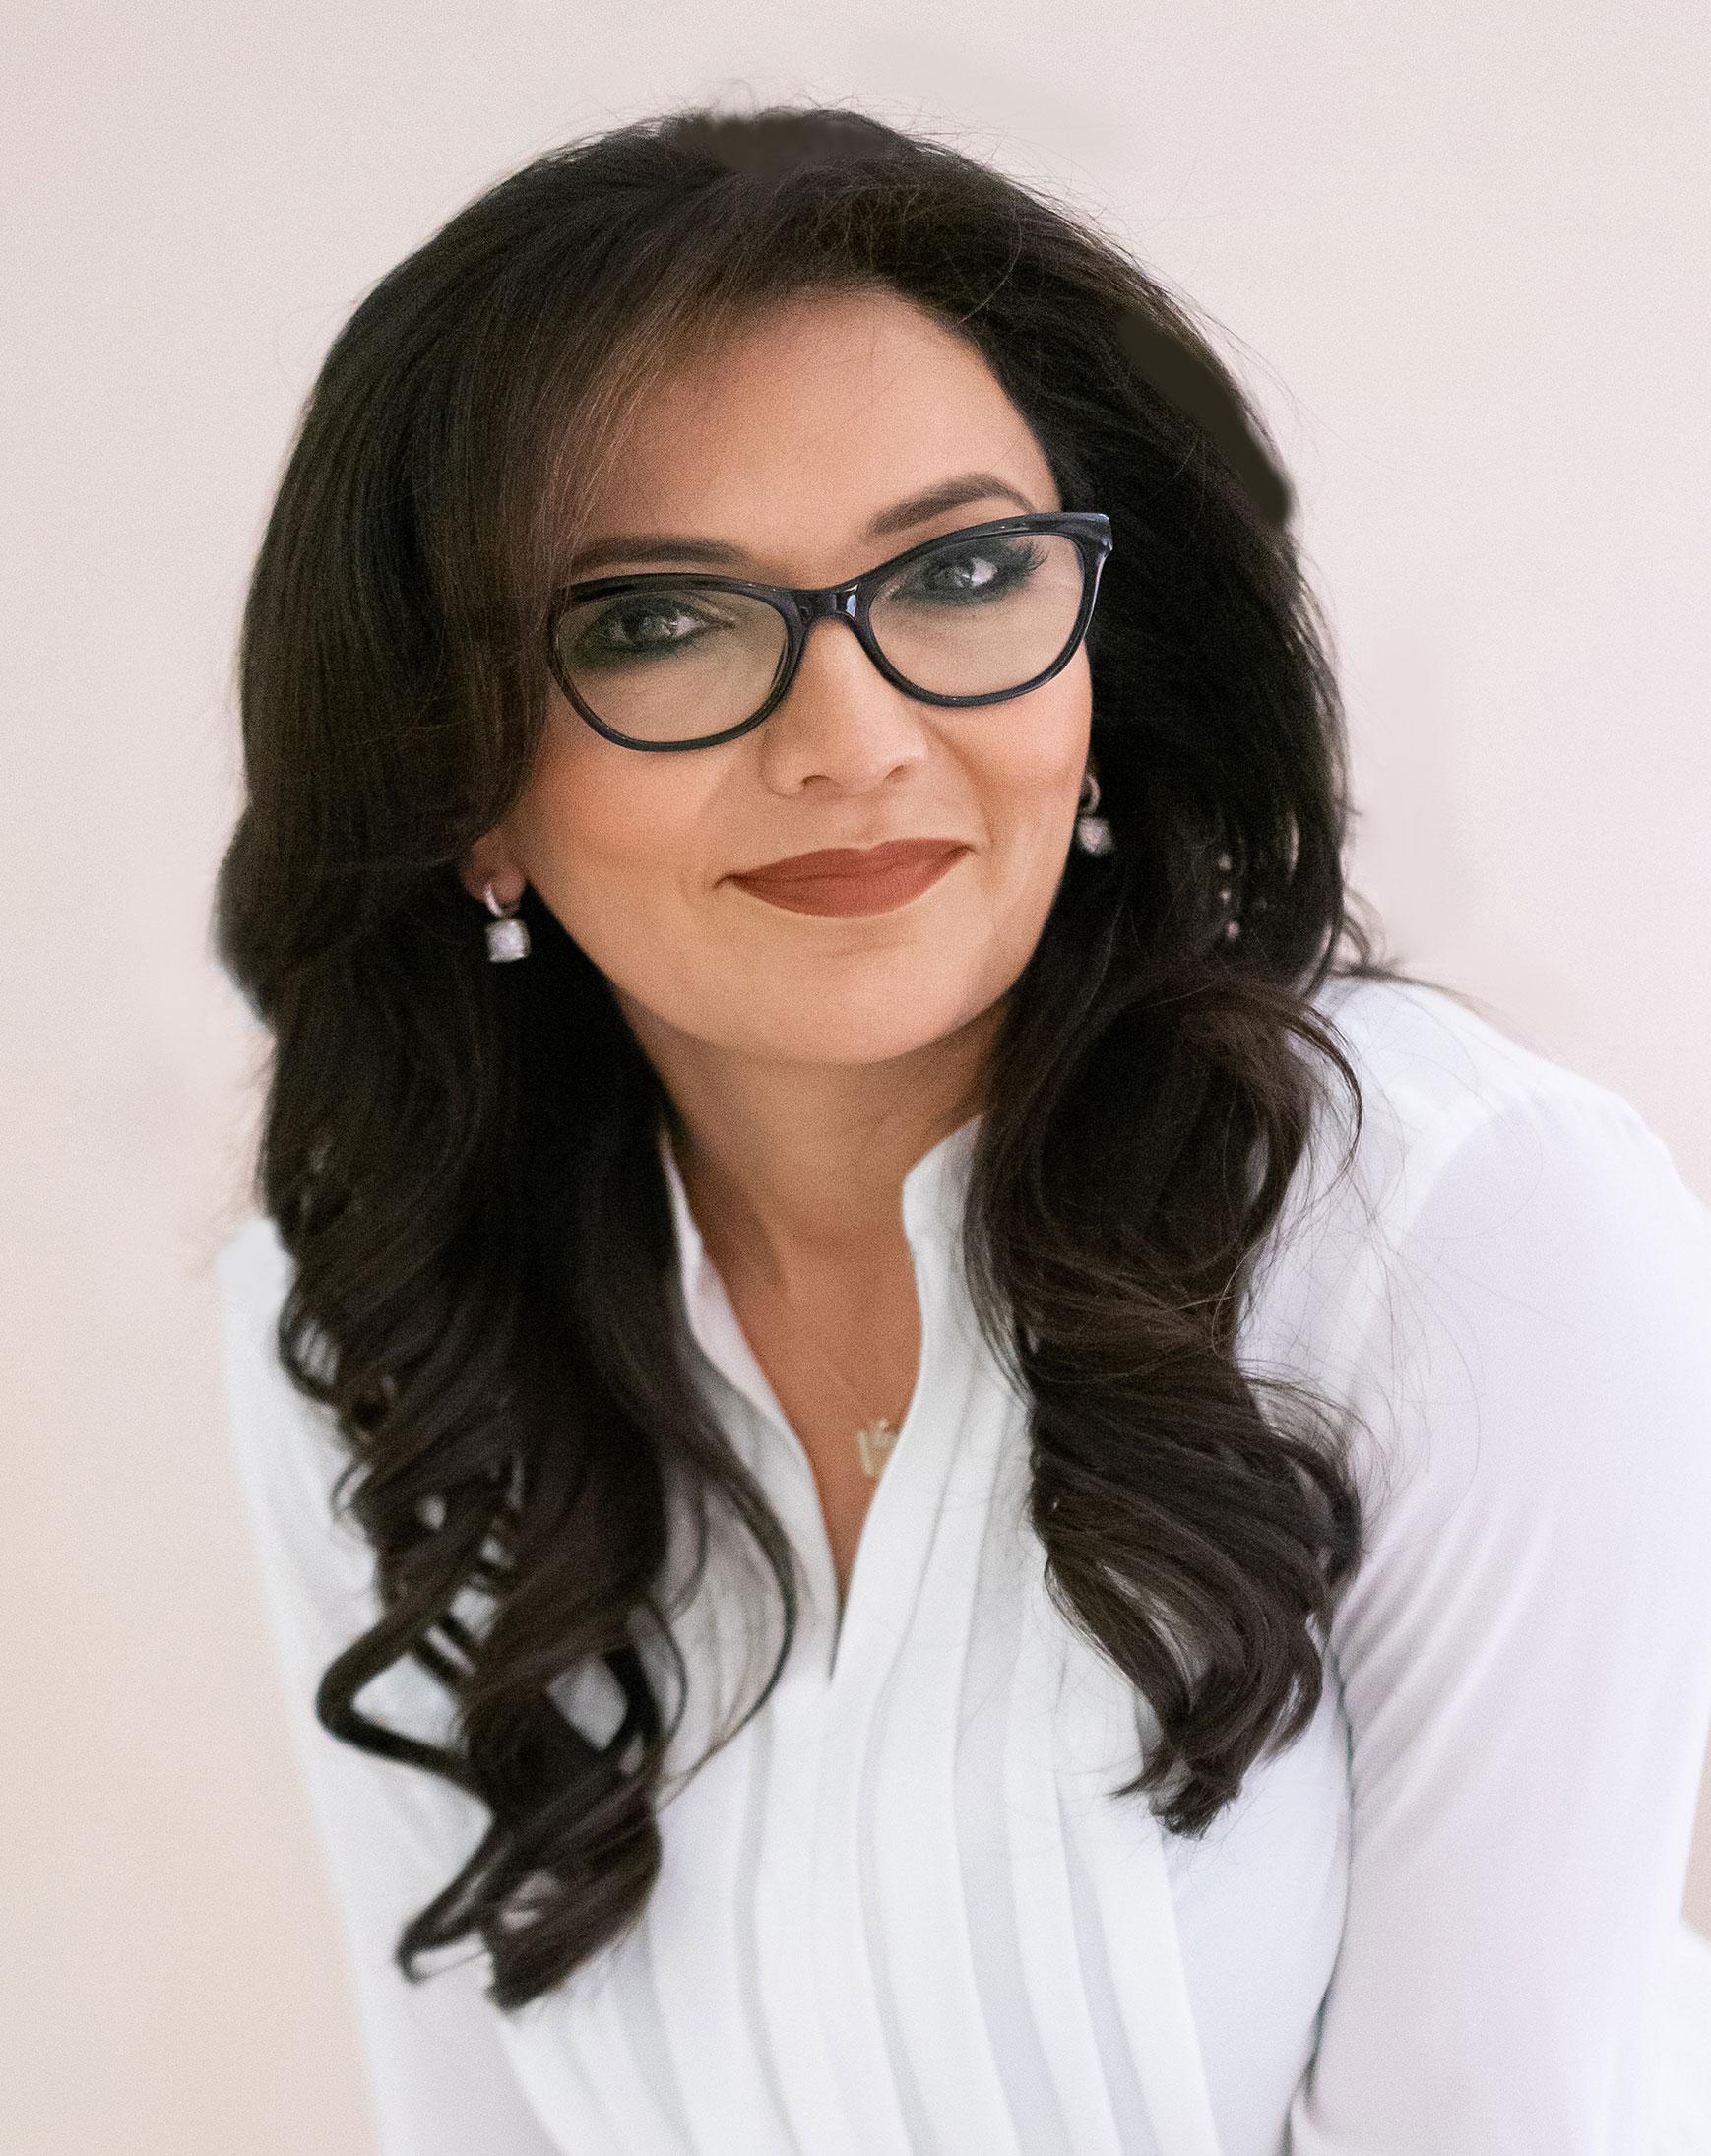 Nina Vaca